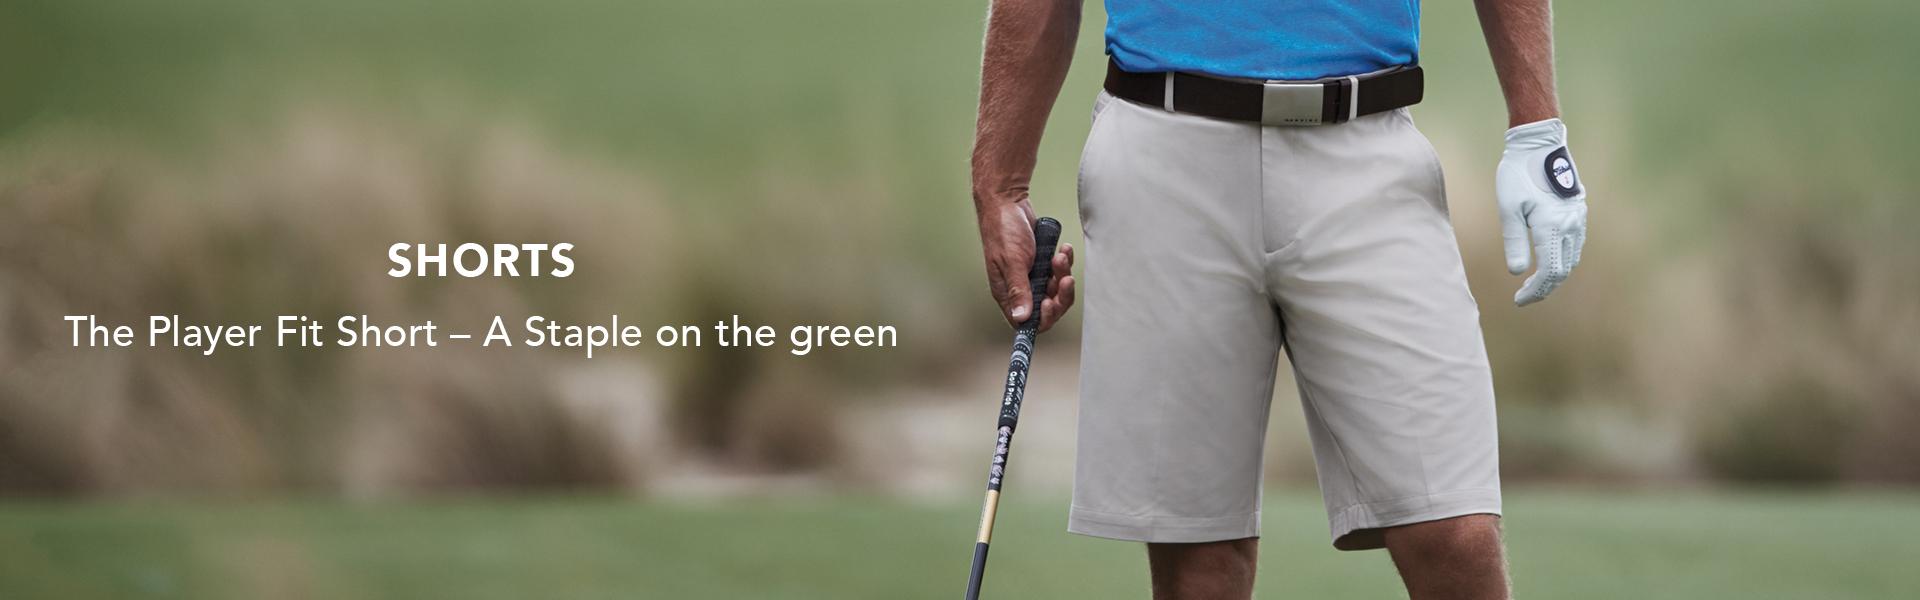 dunning-banner-anchor-golf-shorts.1.18.jpg